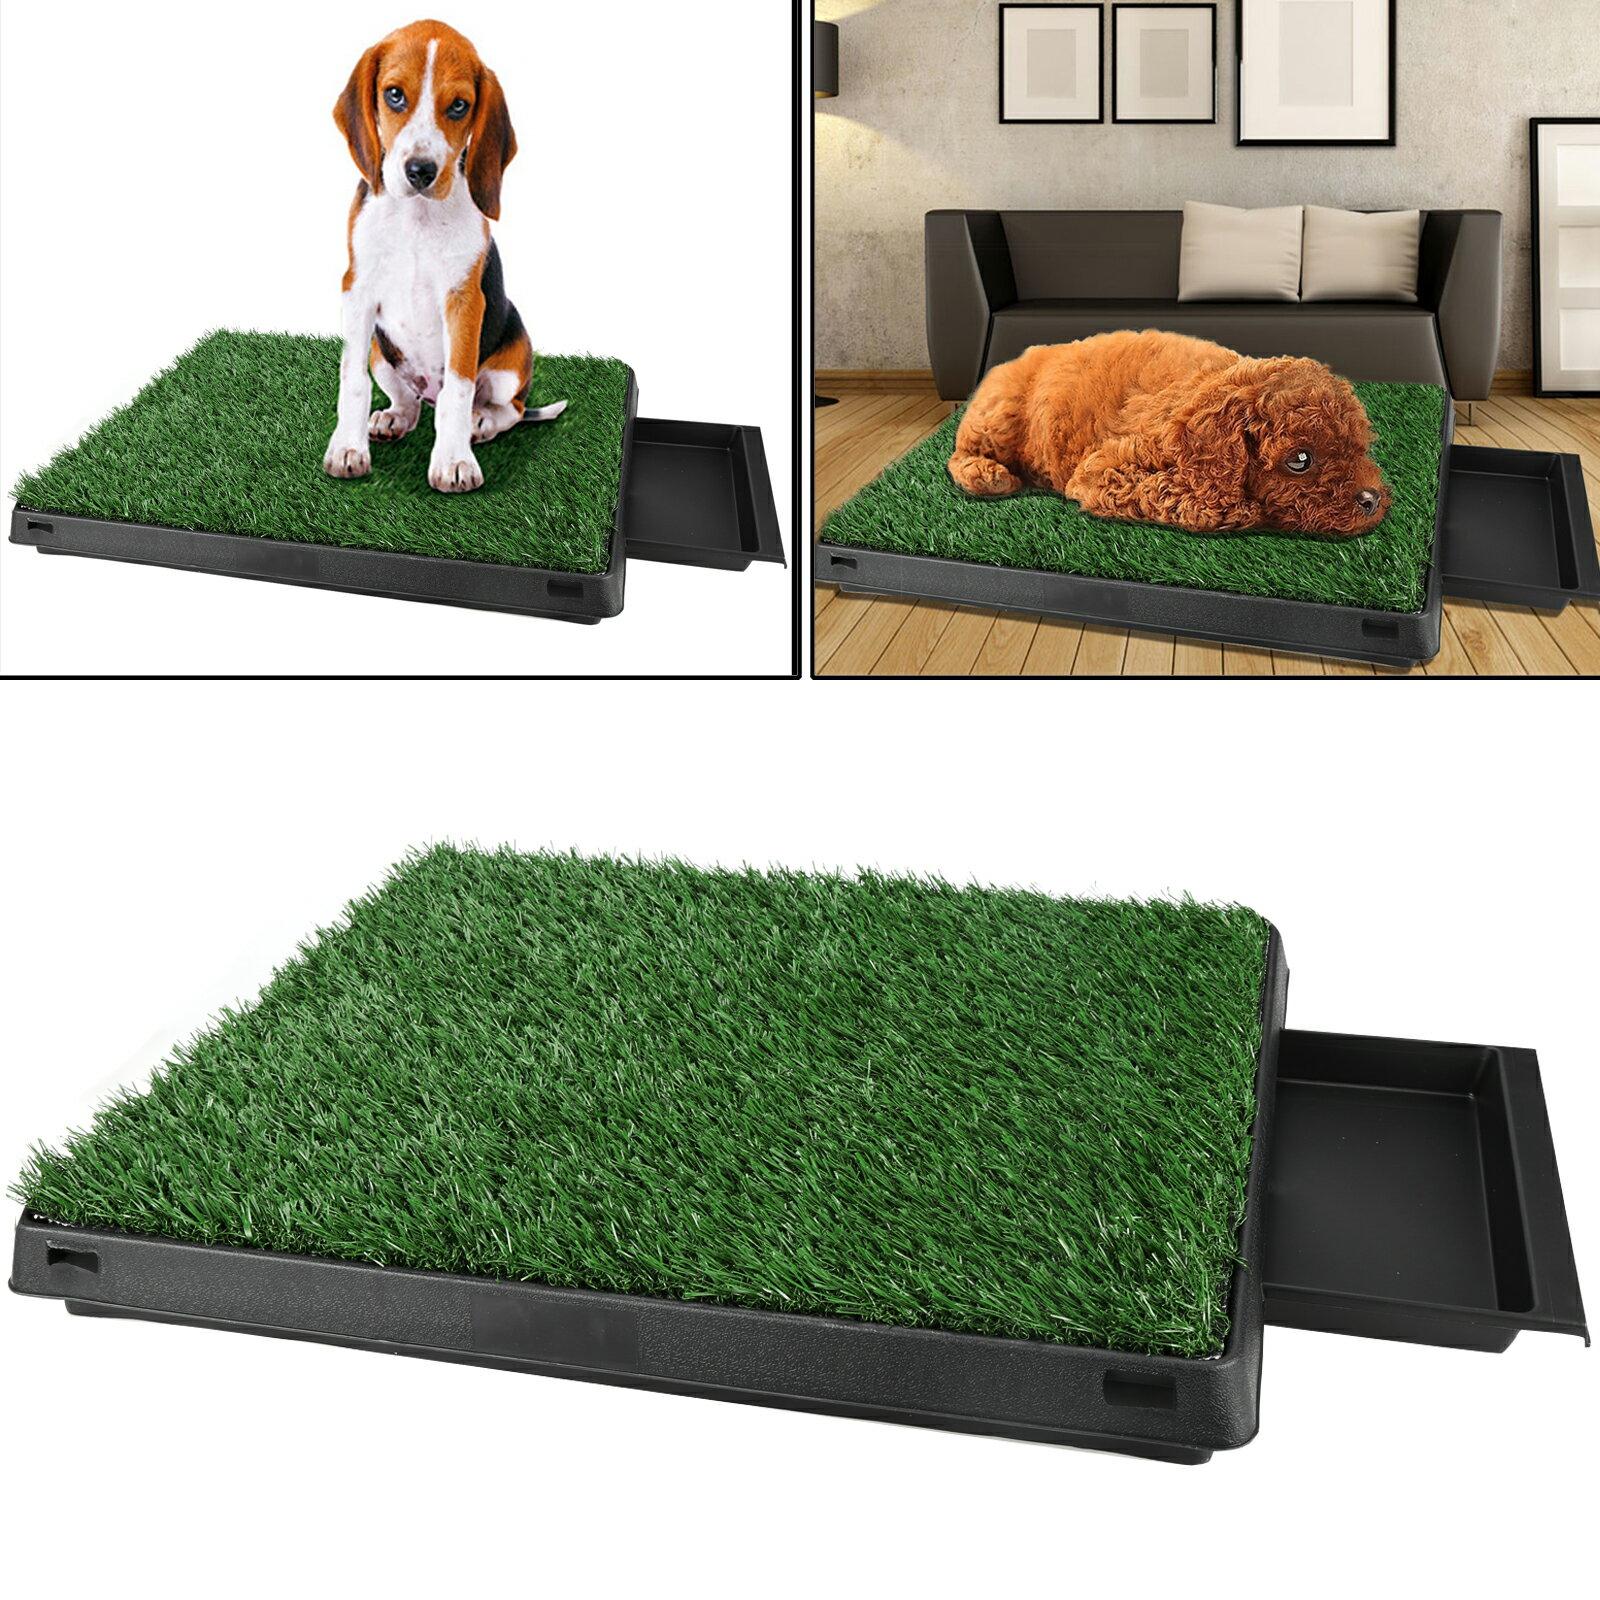 Pet Park Indoor Potty Dog Grass Mat Training Pad Pet Potty 1